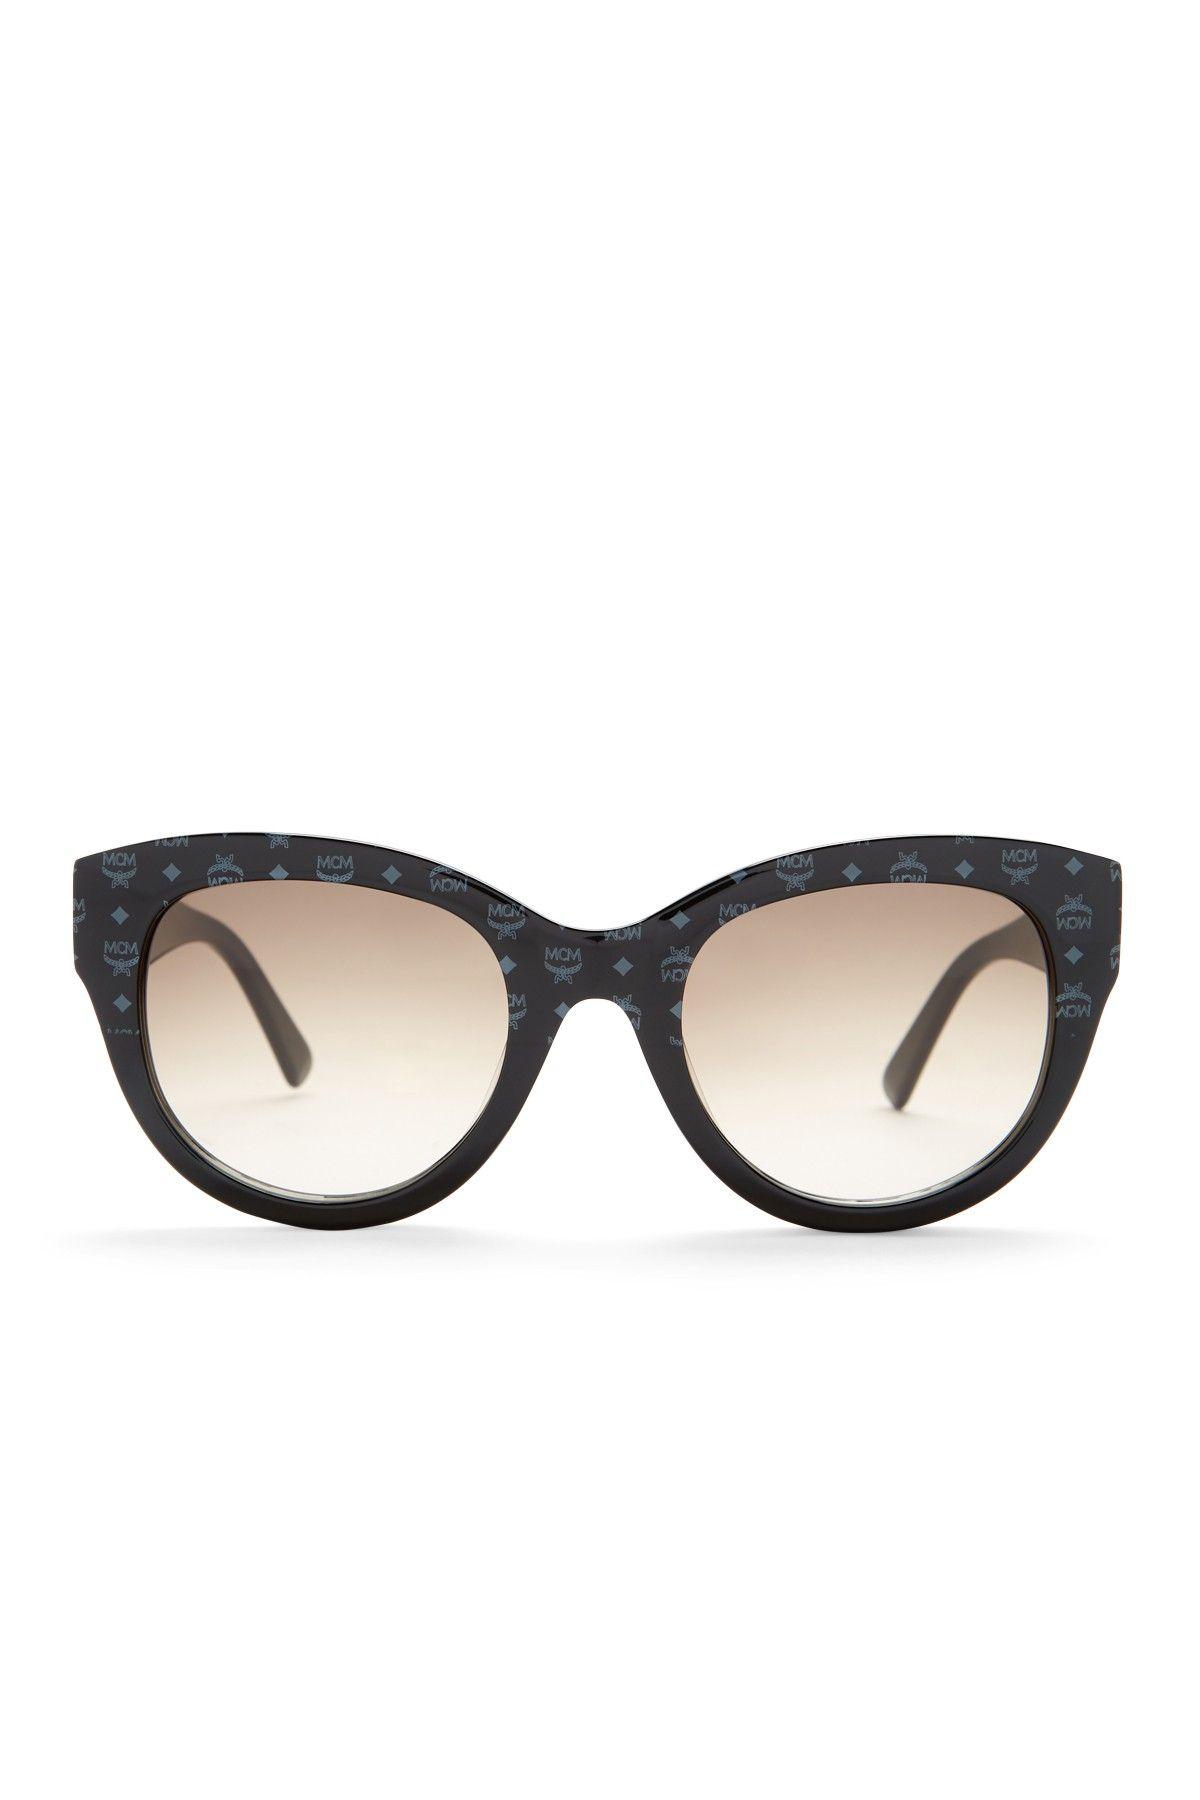 ffc6f3023b Women s Cat Eye Acetate Frame Sunglasses by MCM on  nordstrom rack